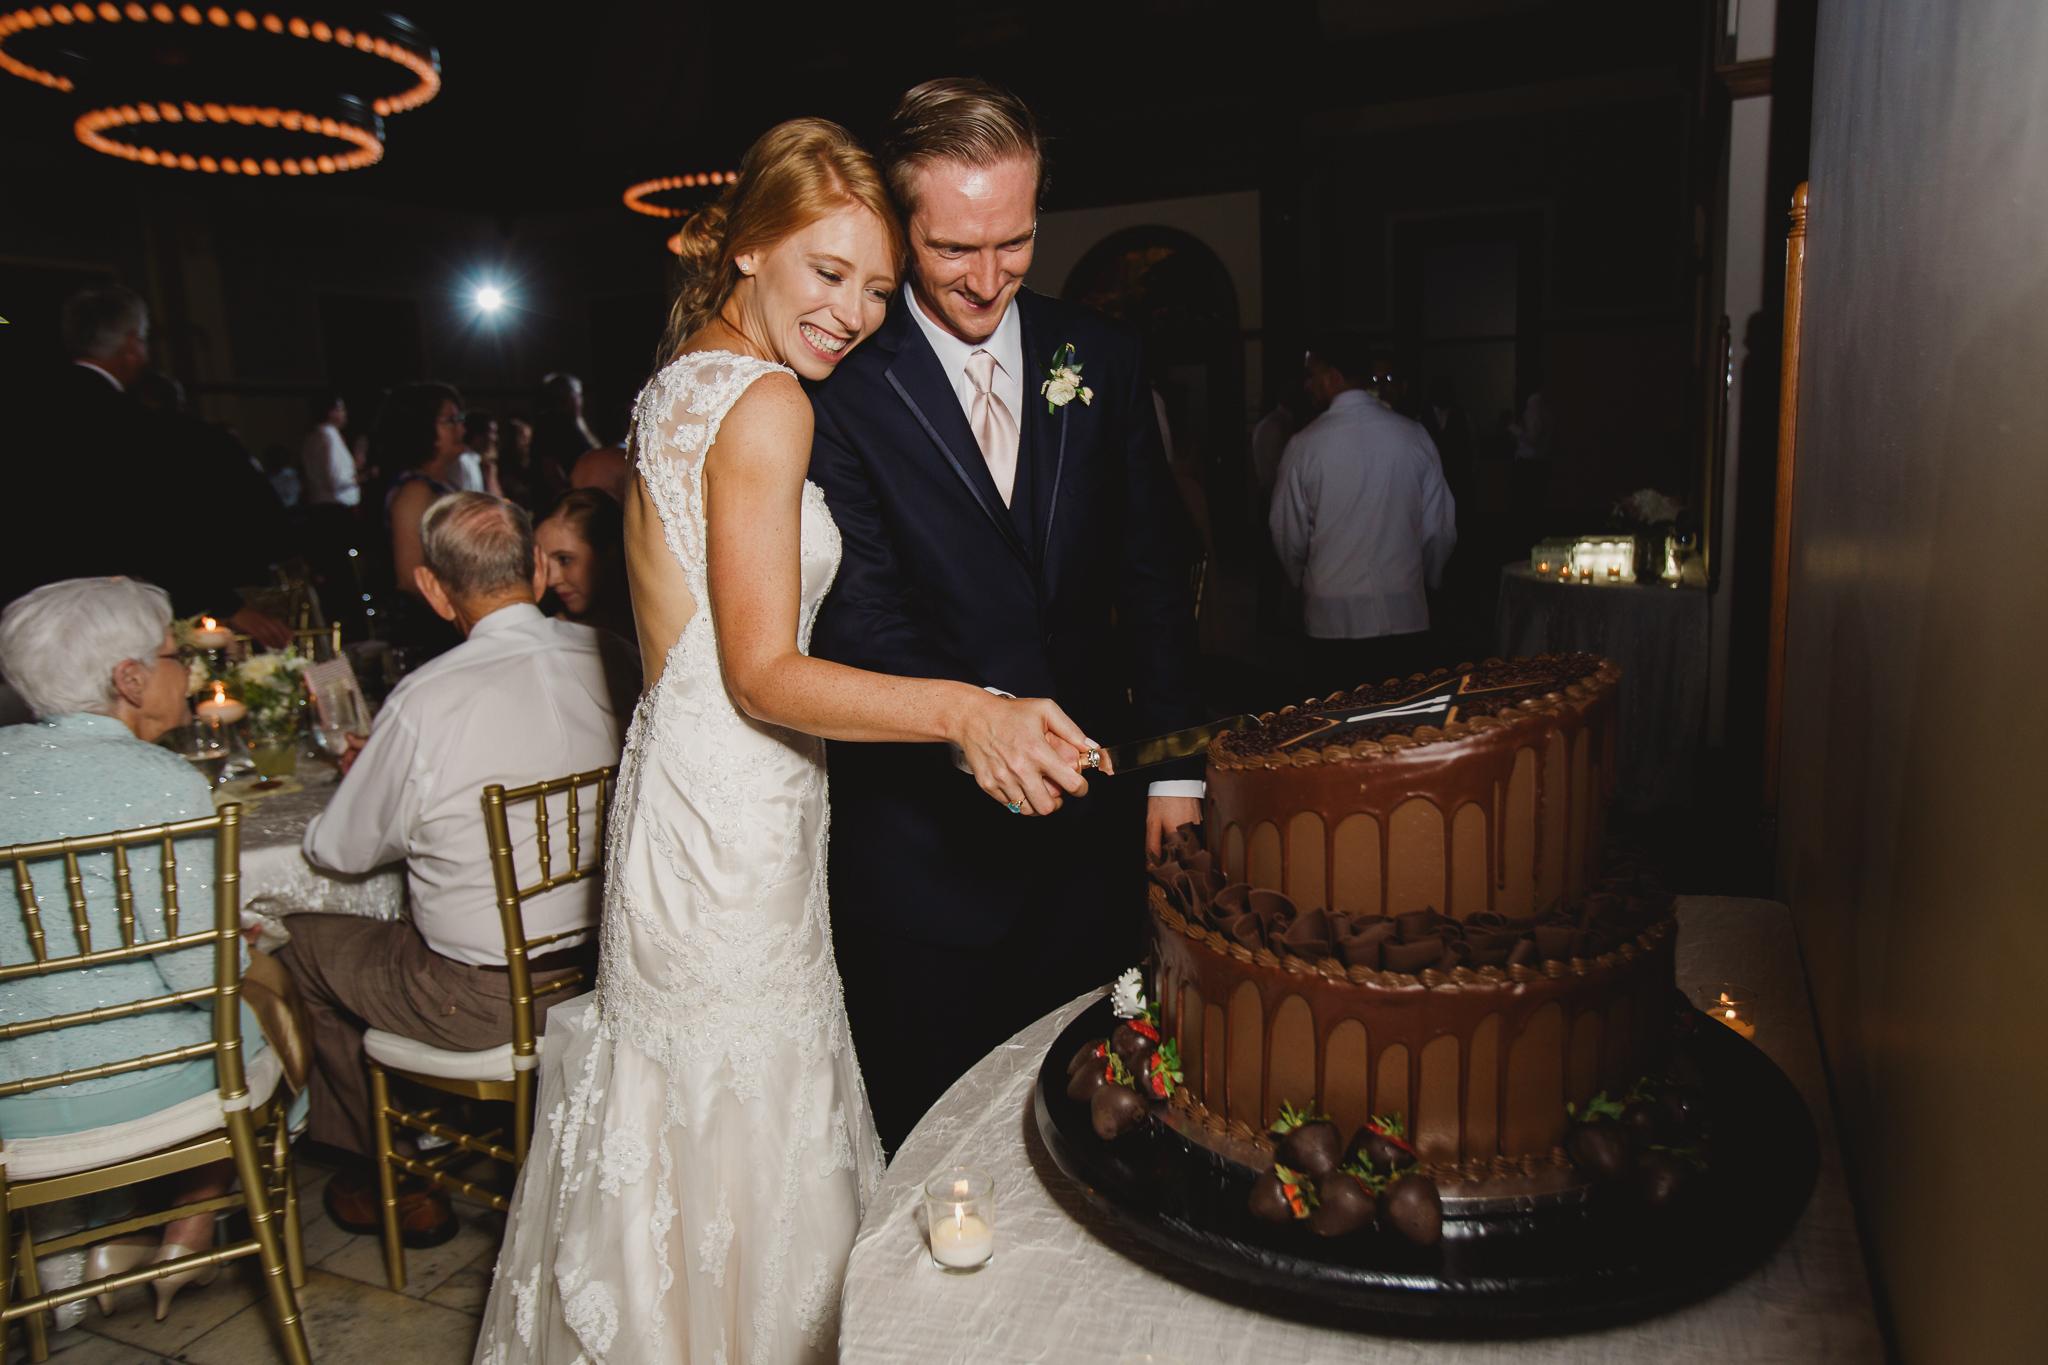 Michael and Kelly - the ashton depot - wedding DFW - wedding photographer- elizalde photography (123 of 150).jpg